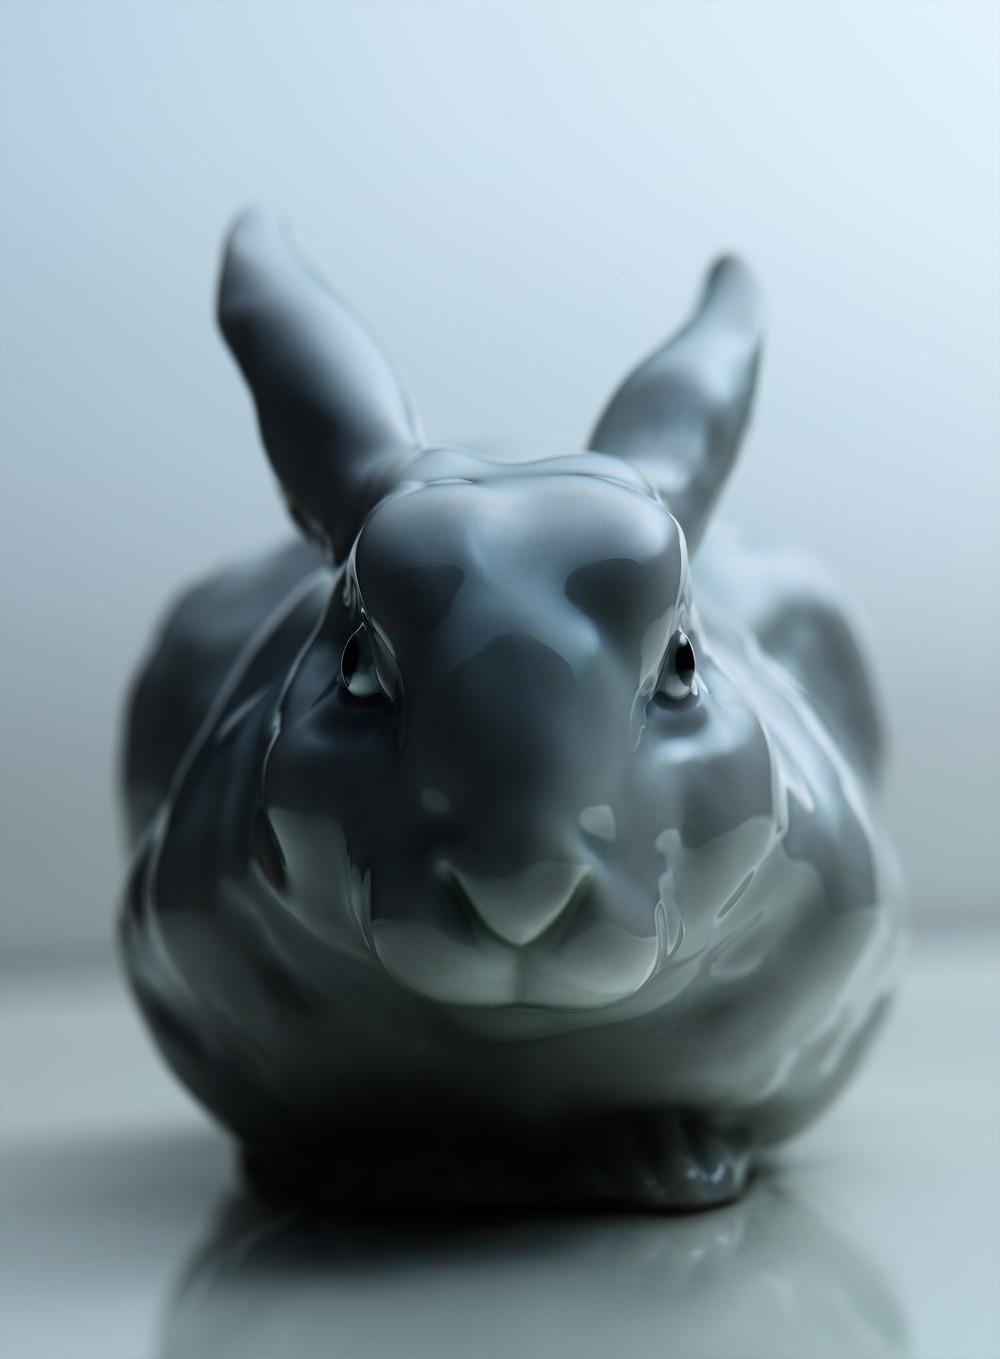 White Rabbit / Personal Work